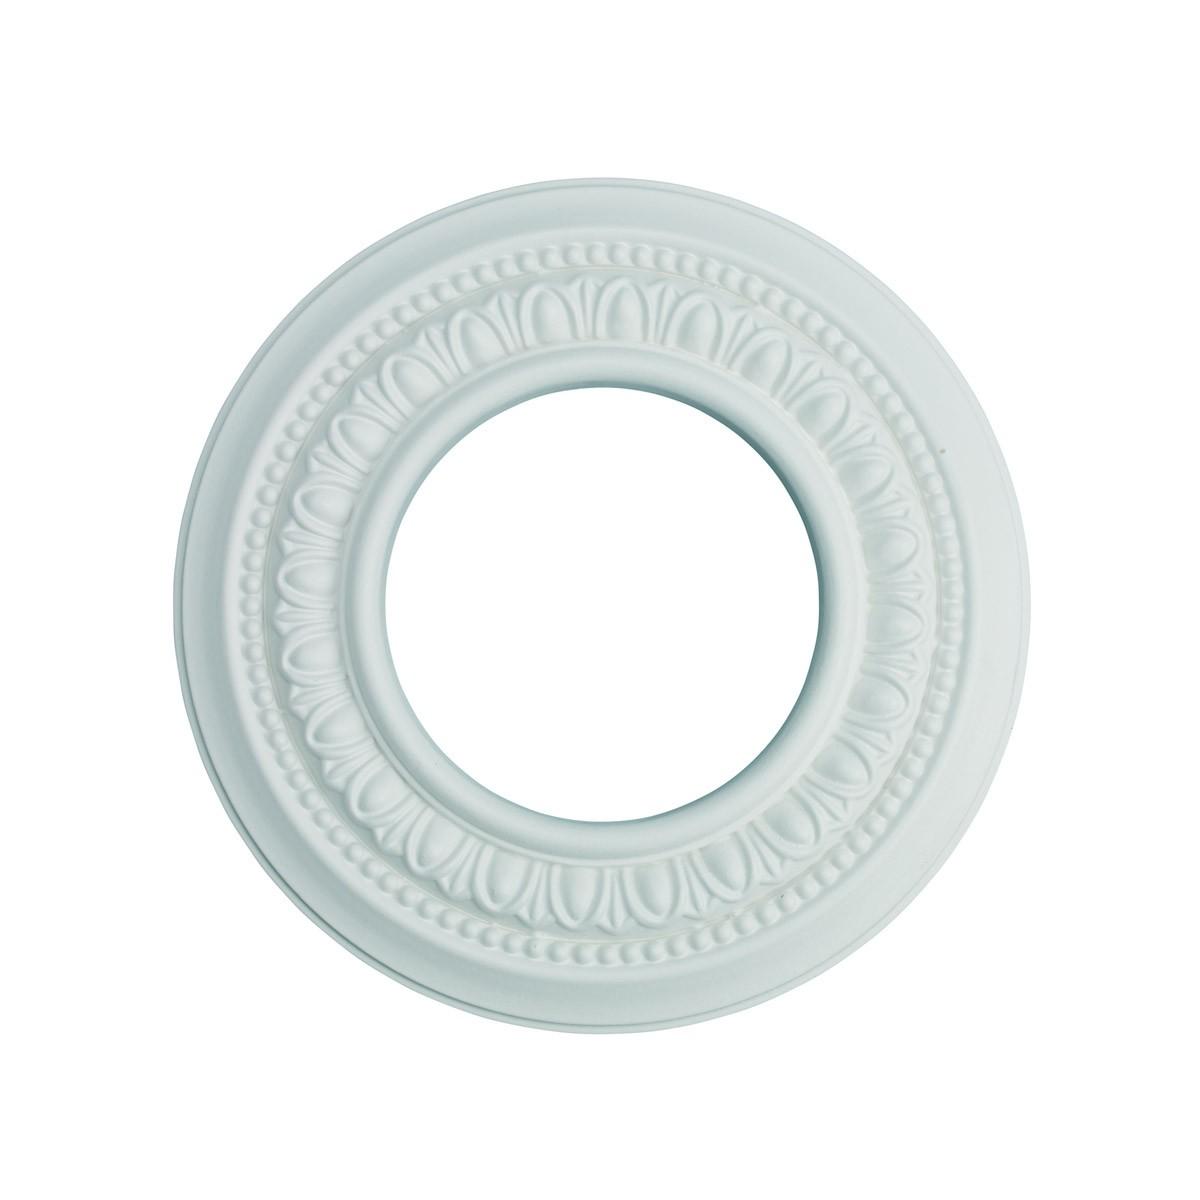 3 Spot Light Ring White Trim 4 ID x 8 OD Mini Medallion 3 Pack Light Medallion Light Medallions Lighting Medallion